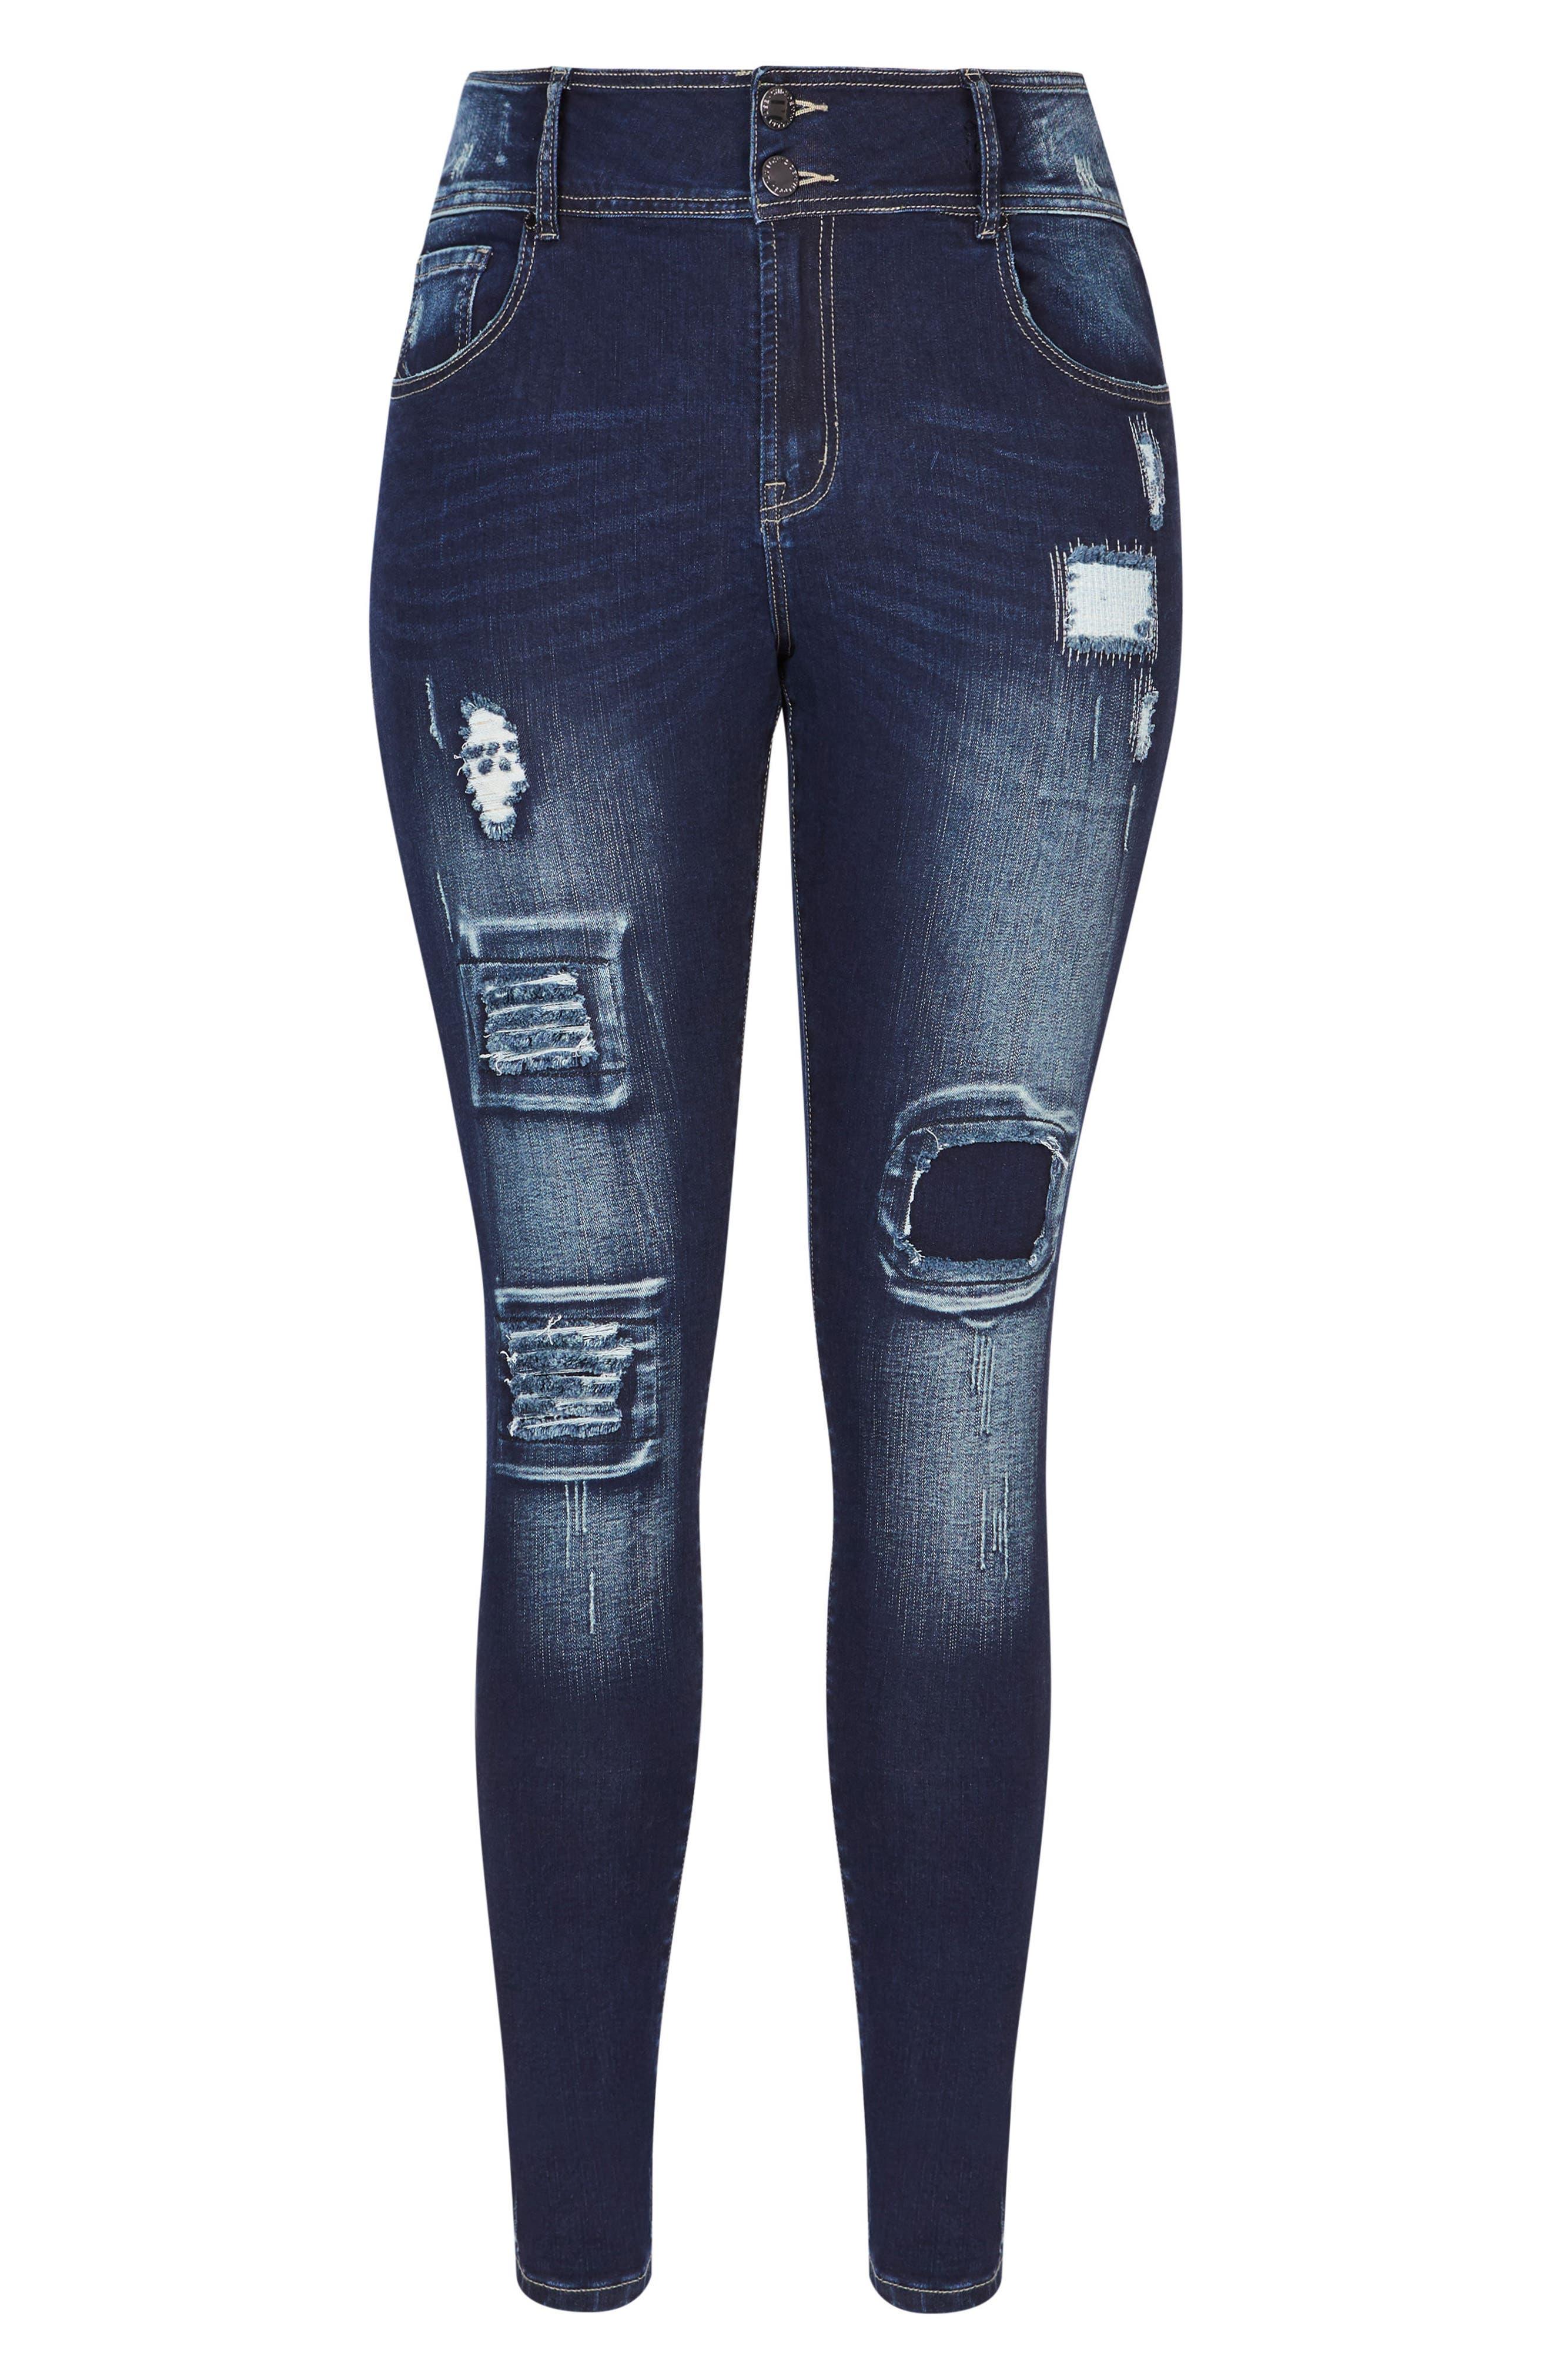 Harley Patched Skinny Jeans,                             Alternate thumbnail 3, color,                             Dark Indigo